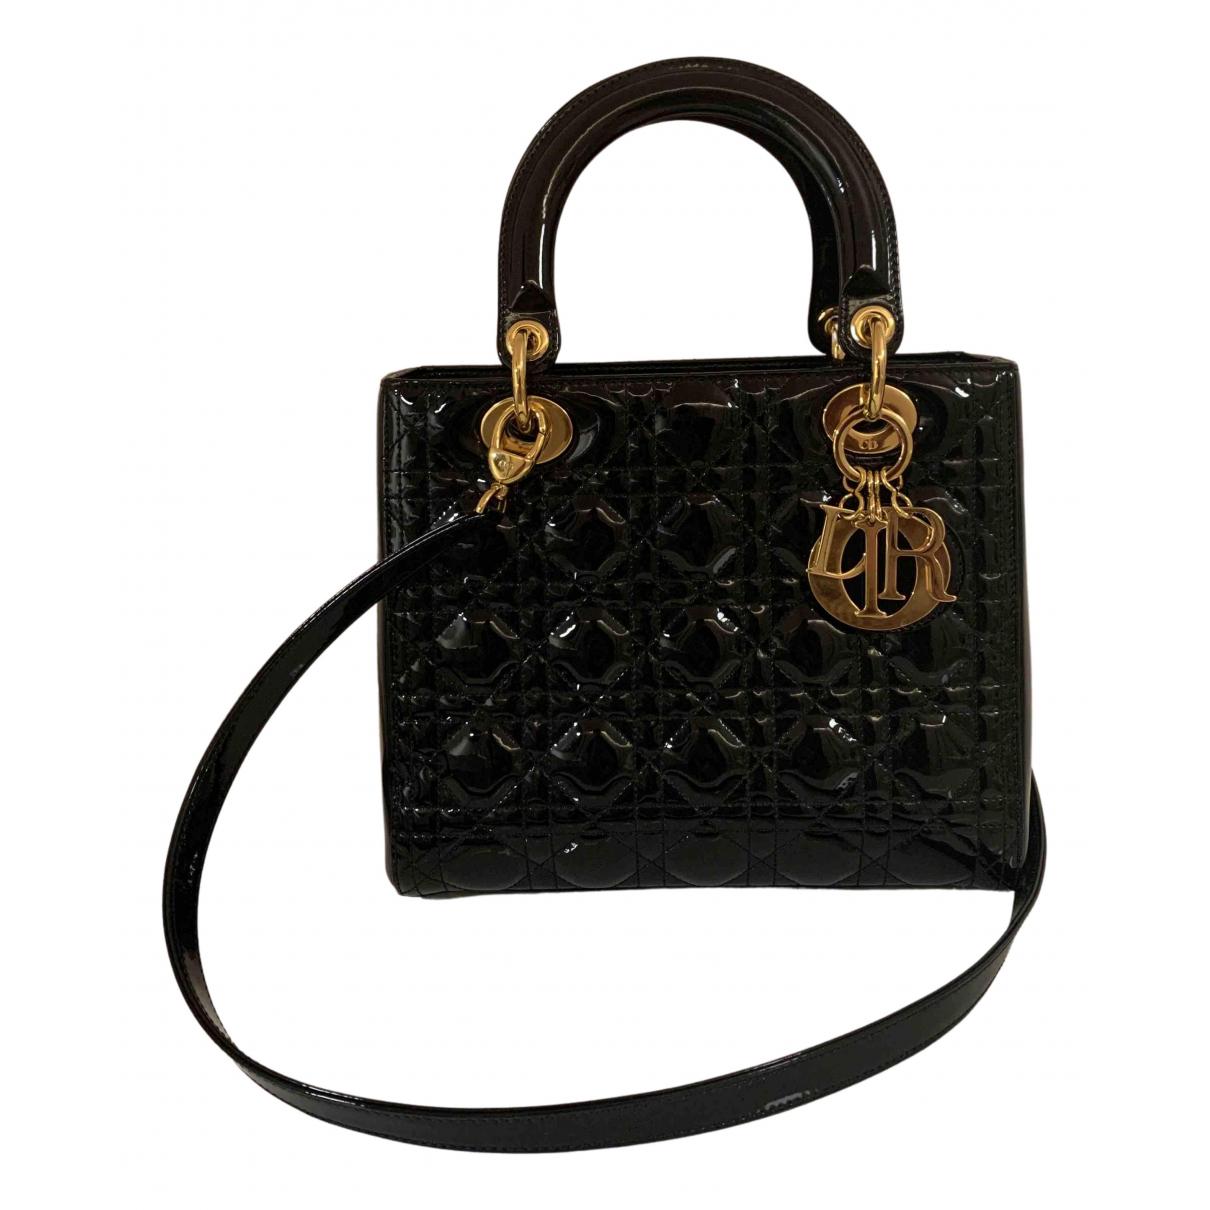 Dior Lady Dior Black Patent leather handbag for Women N